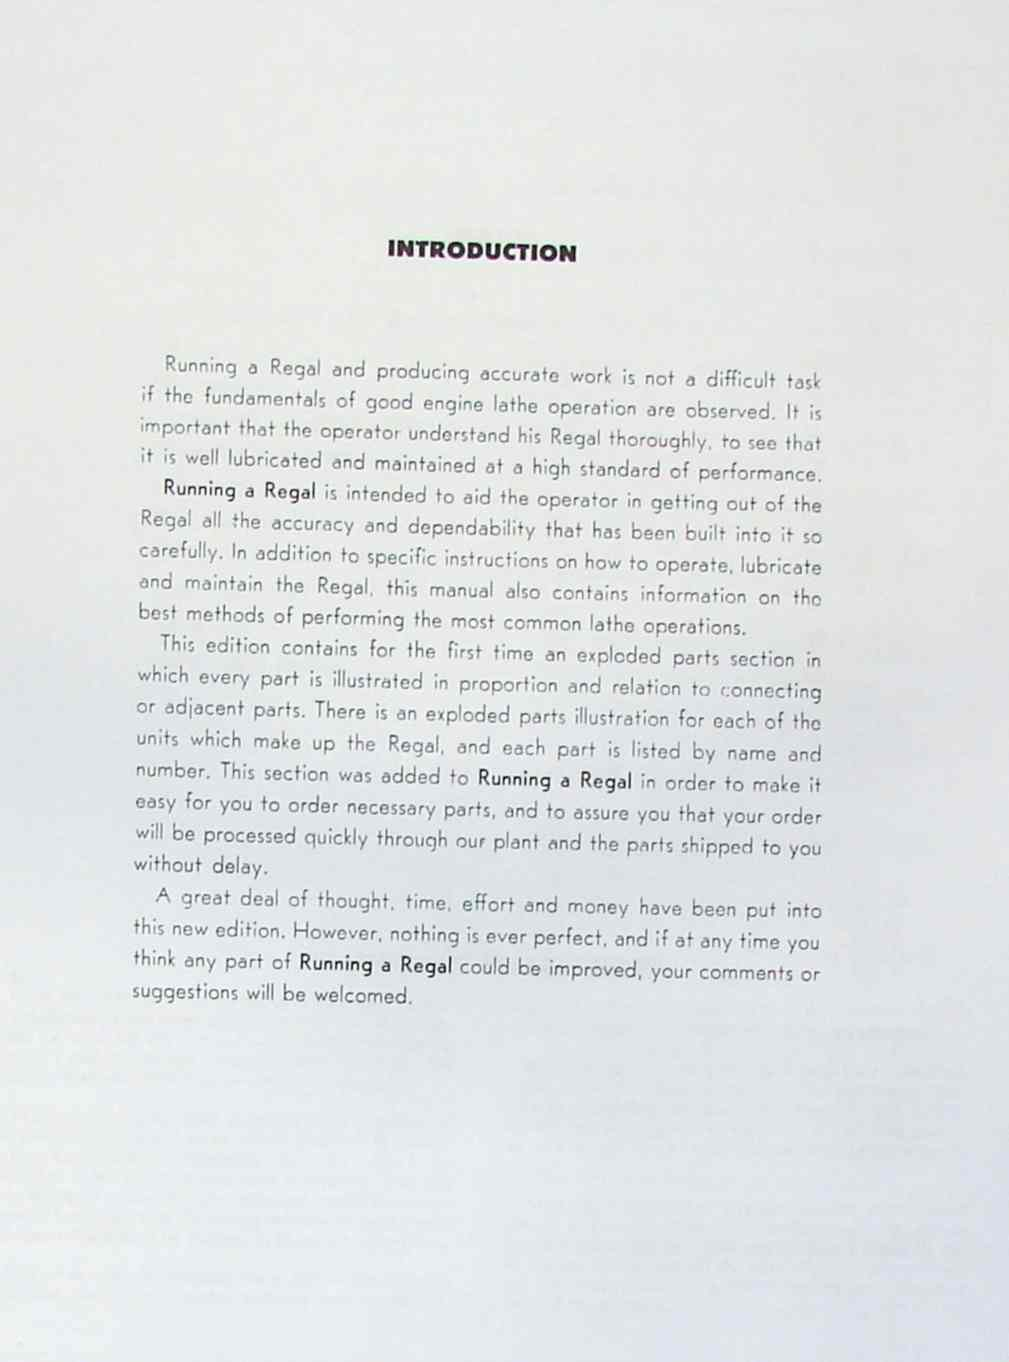 manual of lathe operation pdf